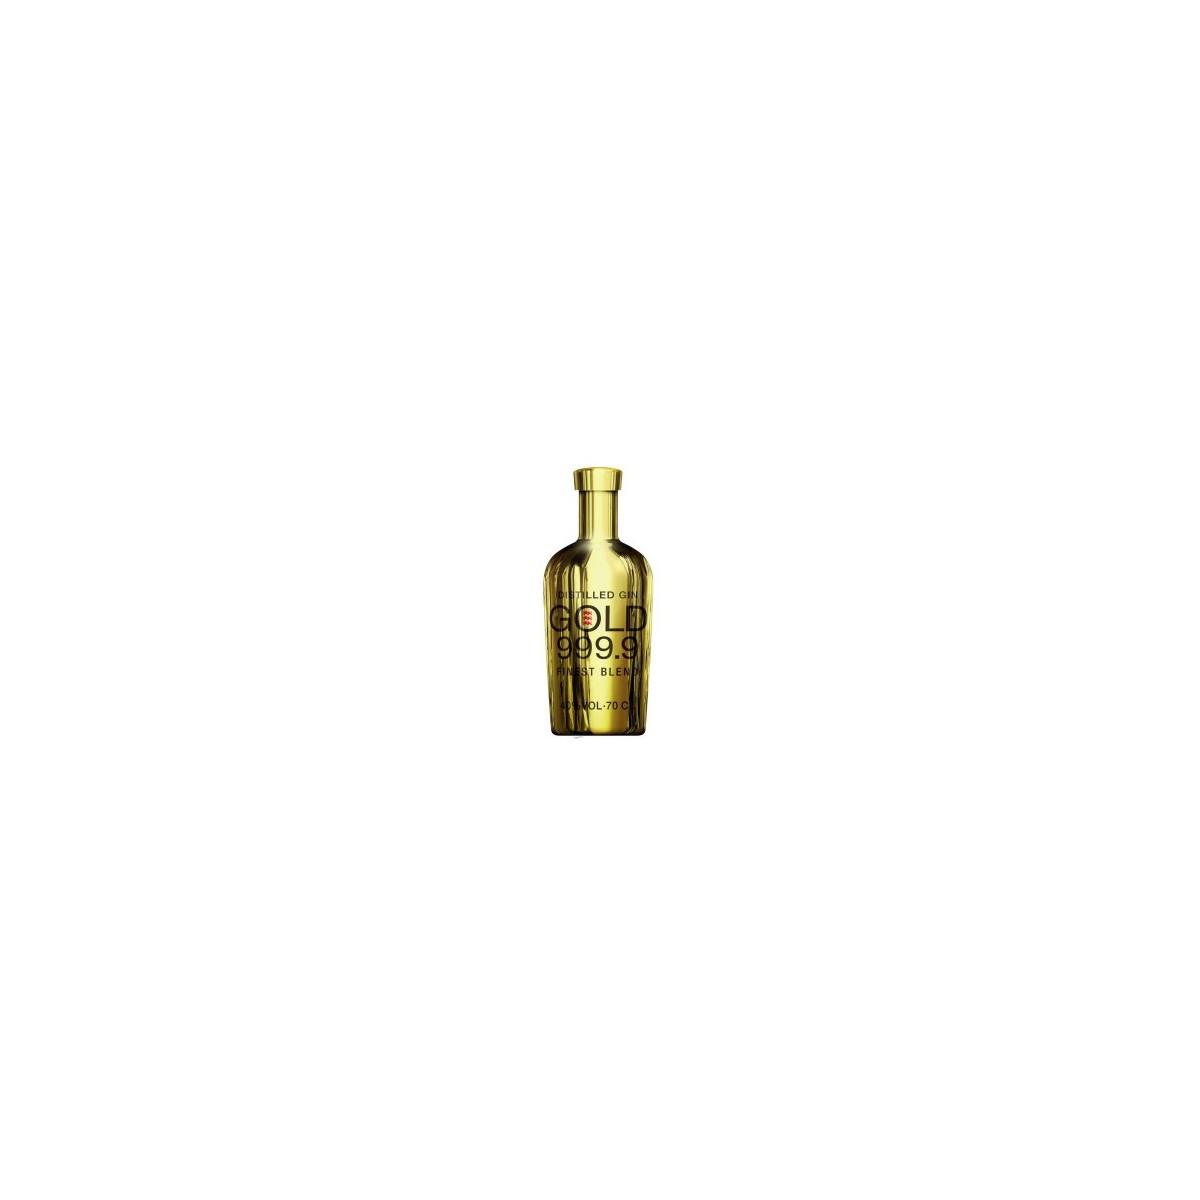 GINEBRA GOLD 999.9